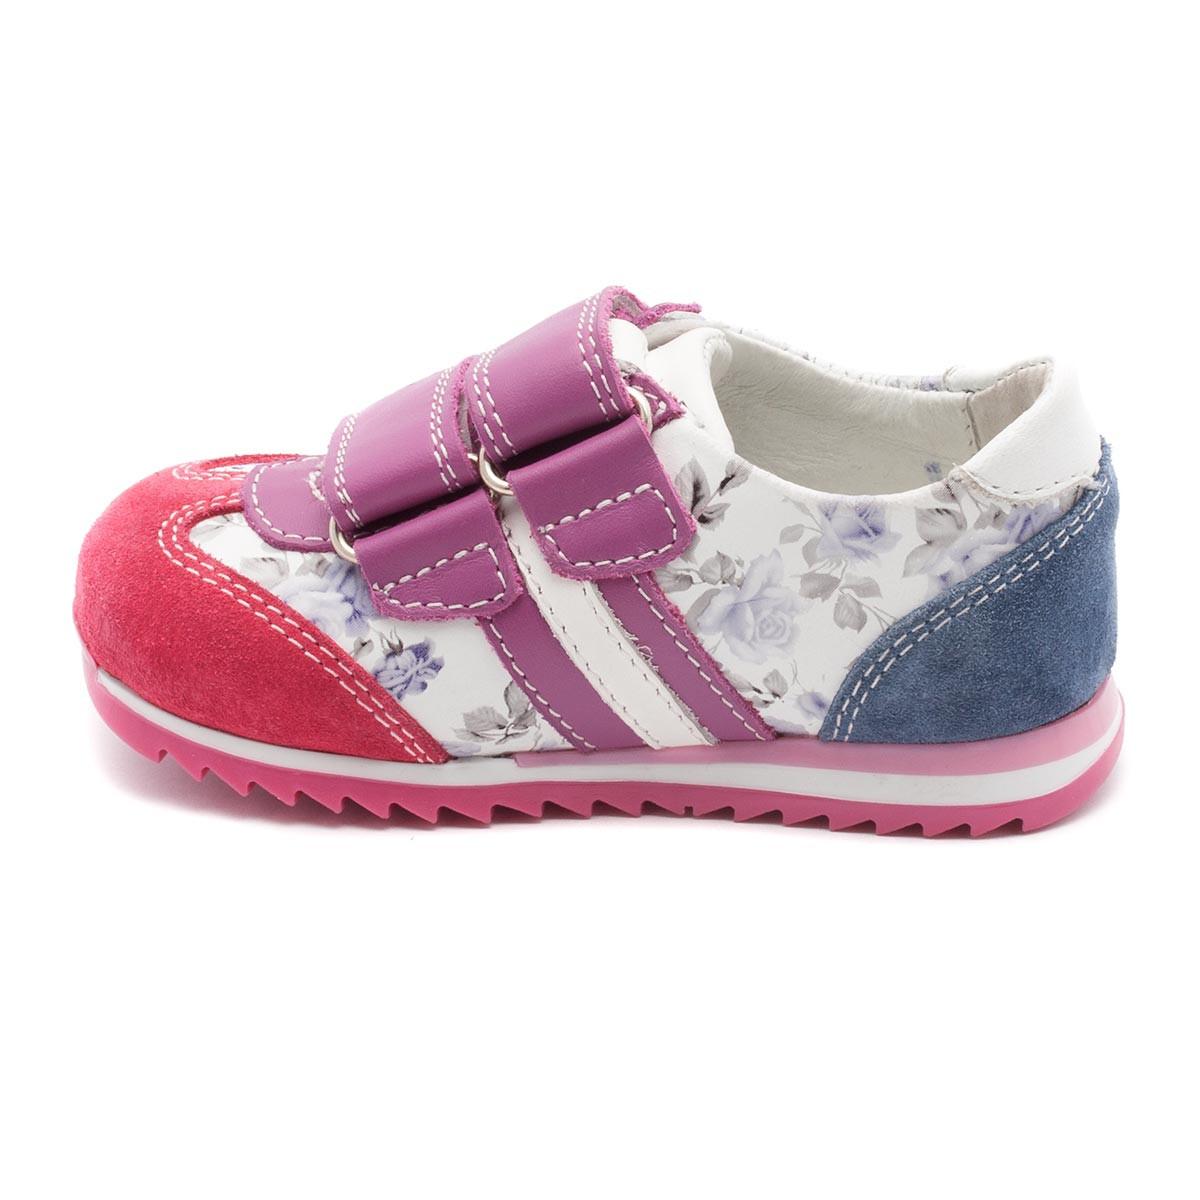 e35c14c2 ... Ортопедические кроссовки FS Сollection для девочки, размер 20-30, фото 3